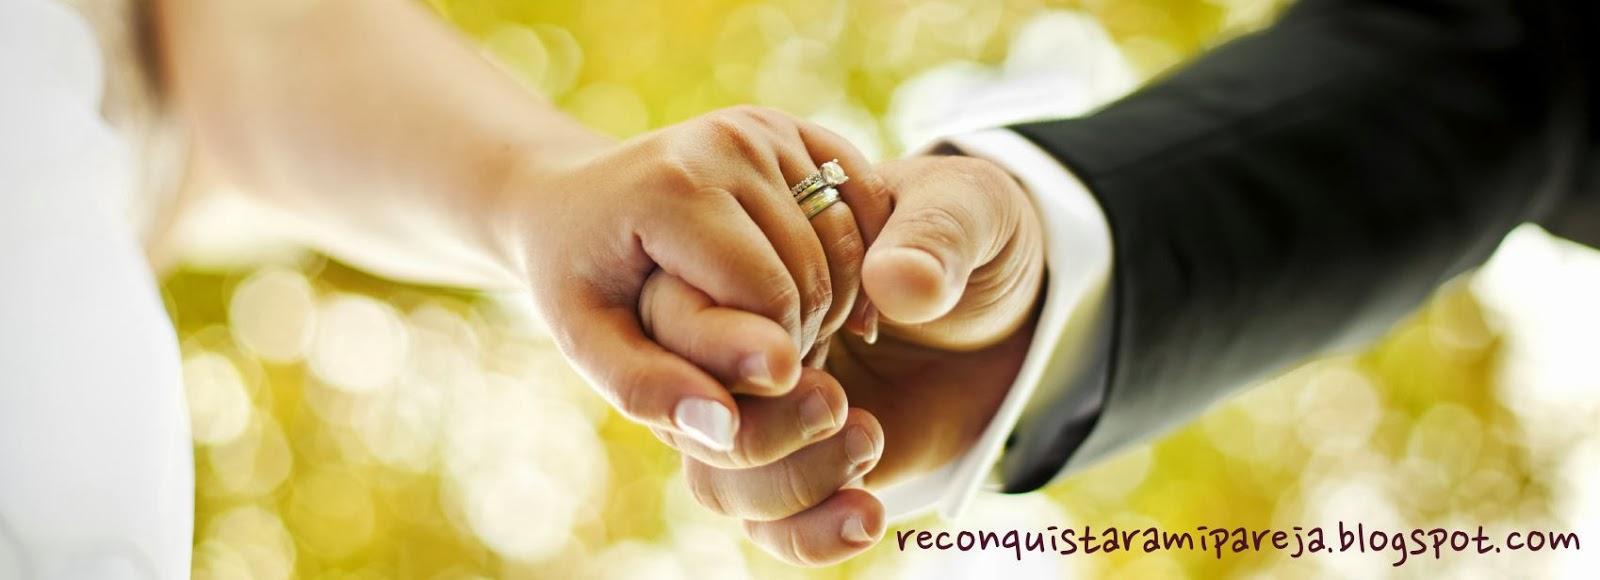 ¿Para quien es el matrimonio? - EL MATRIMONIO NO ES PARA MI - ¿Para que sirve el matrimonio? - ¿Qué es para ti el matromonio?